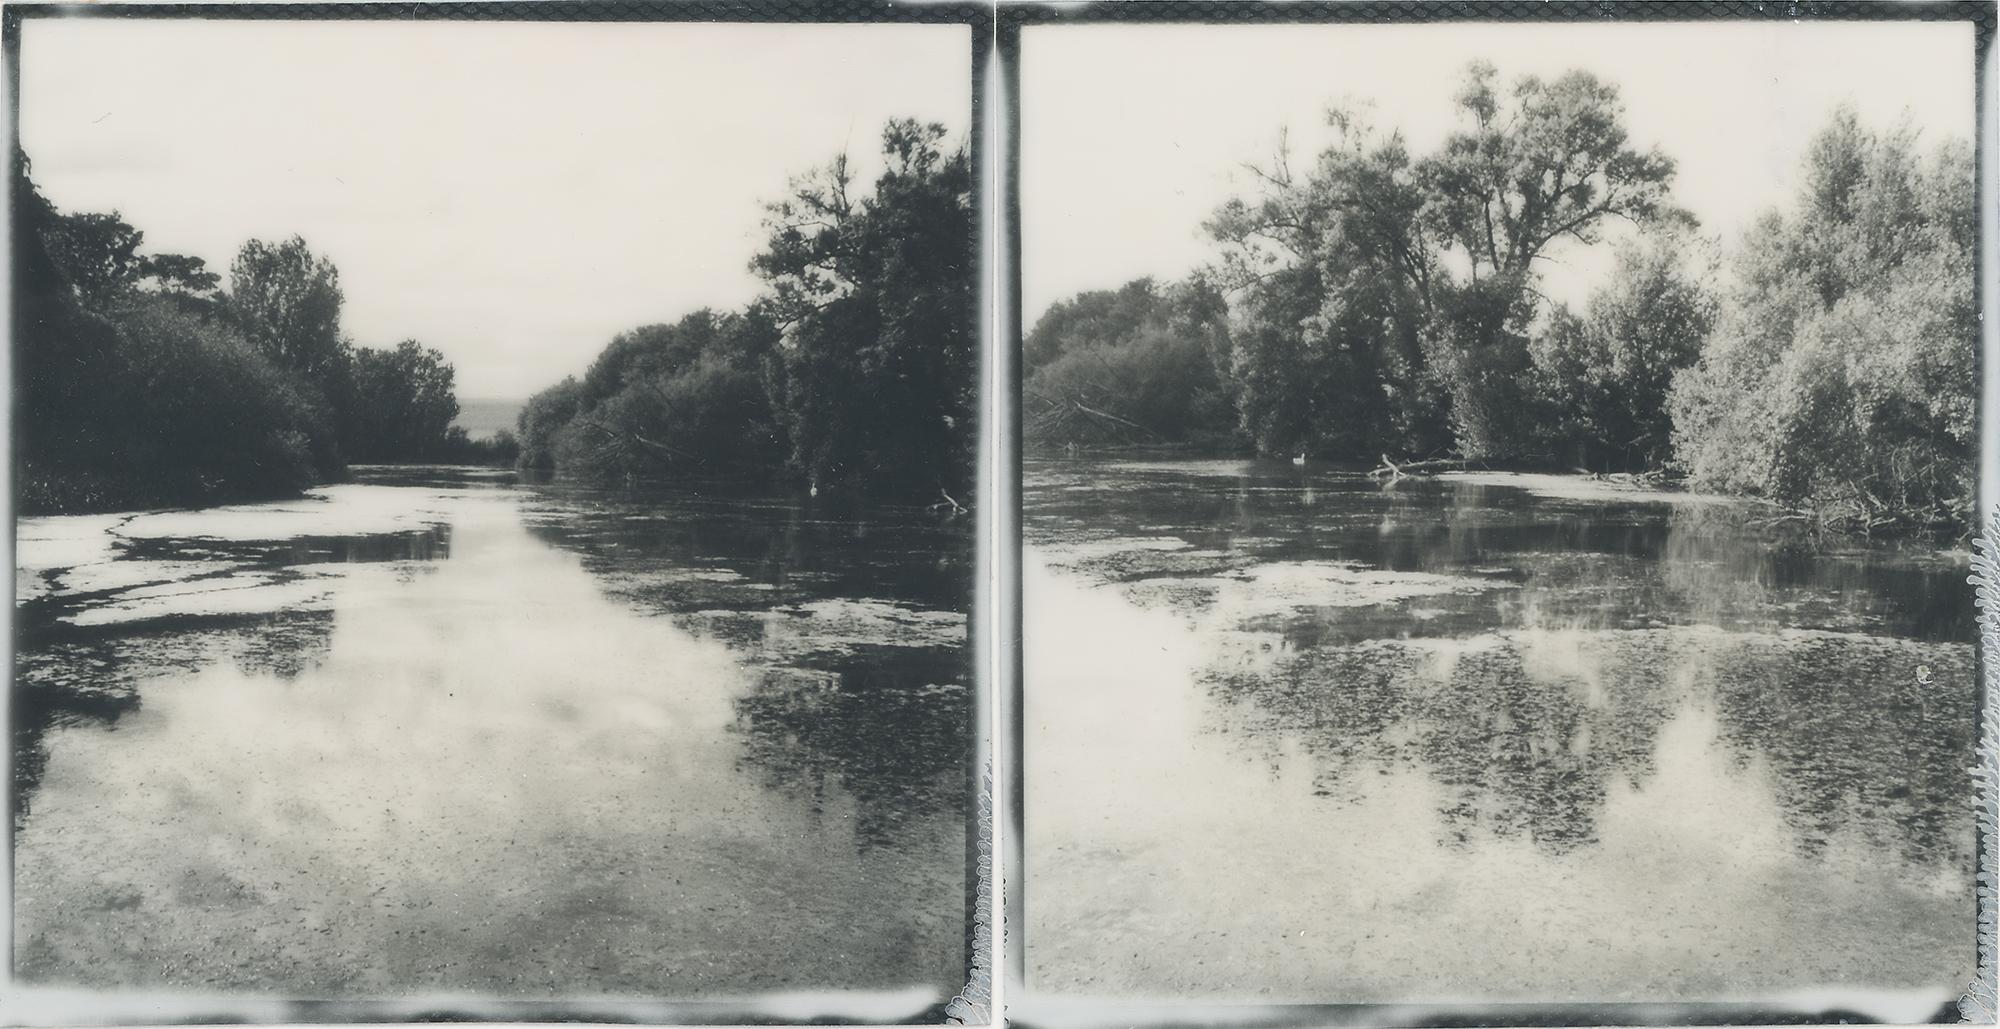 Swan Pond | SX-70 | Impossible Project Gen 2 Film | Mark Hillyer |